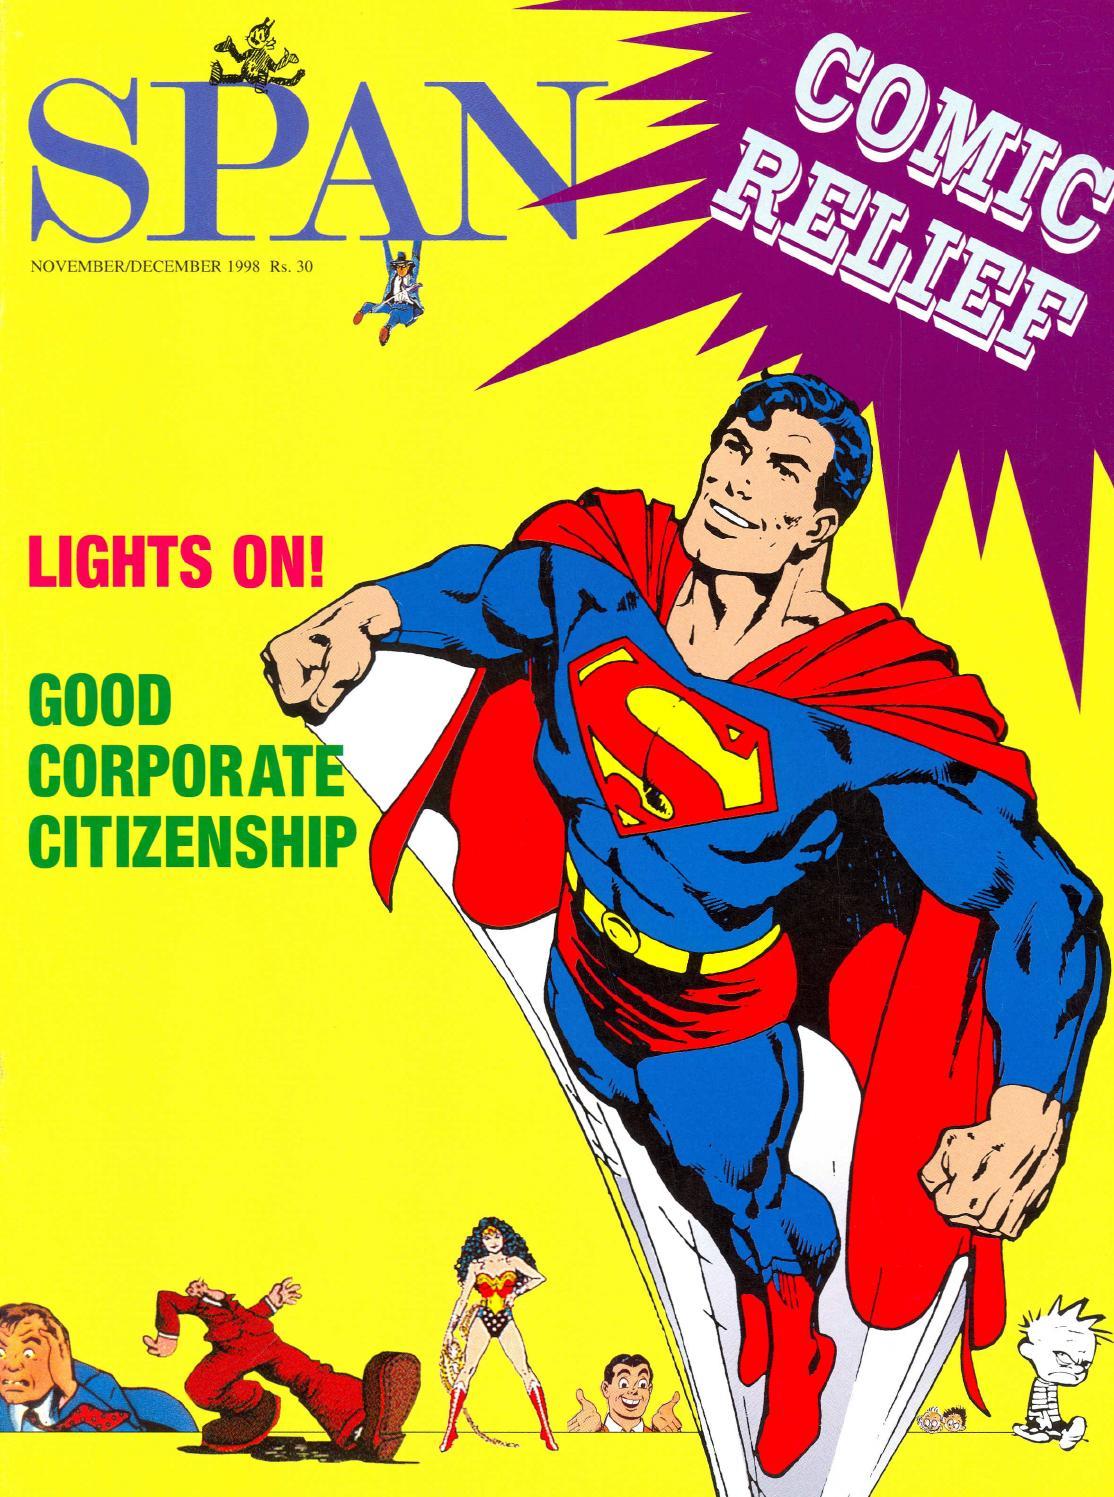 Minimalist Comic Character Movie Posters Minimal Posterity SUPERHEROES